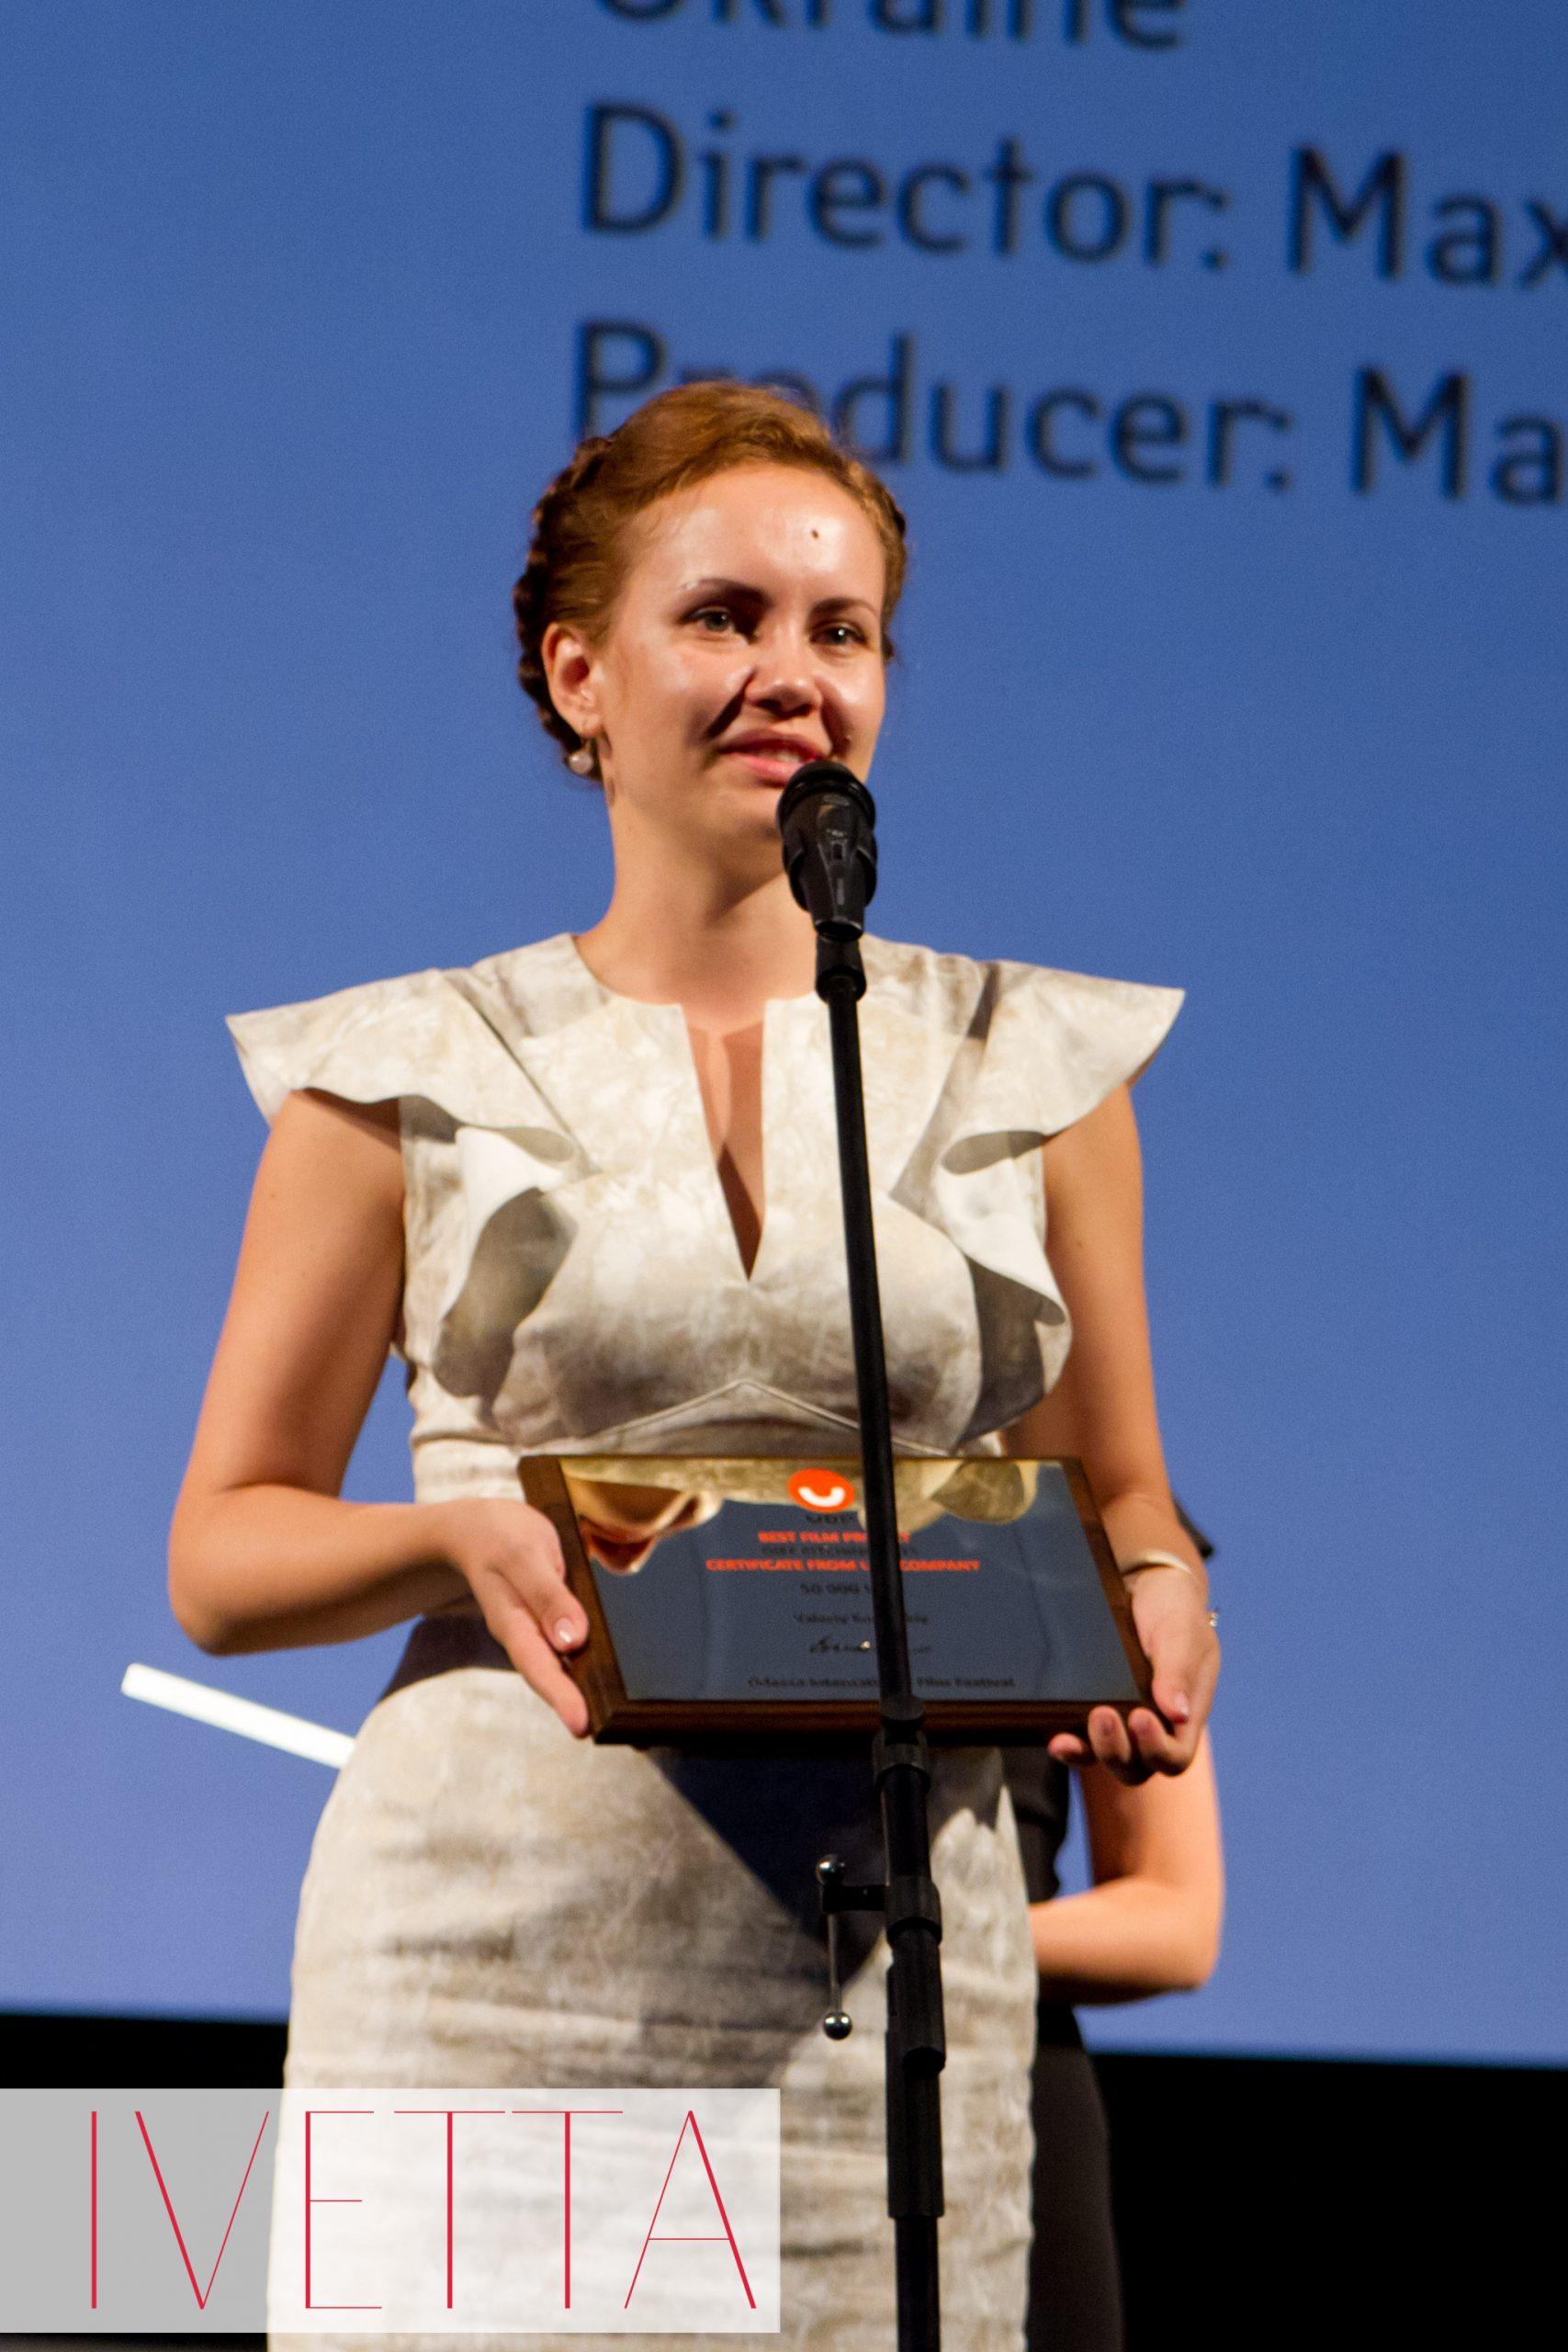 победителя питчинга наградили 50 000 гривен